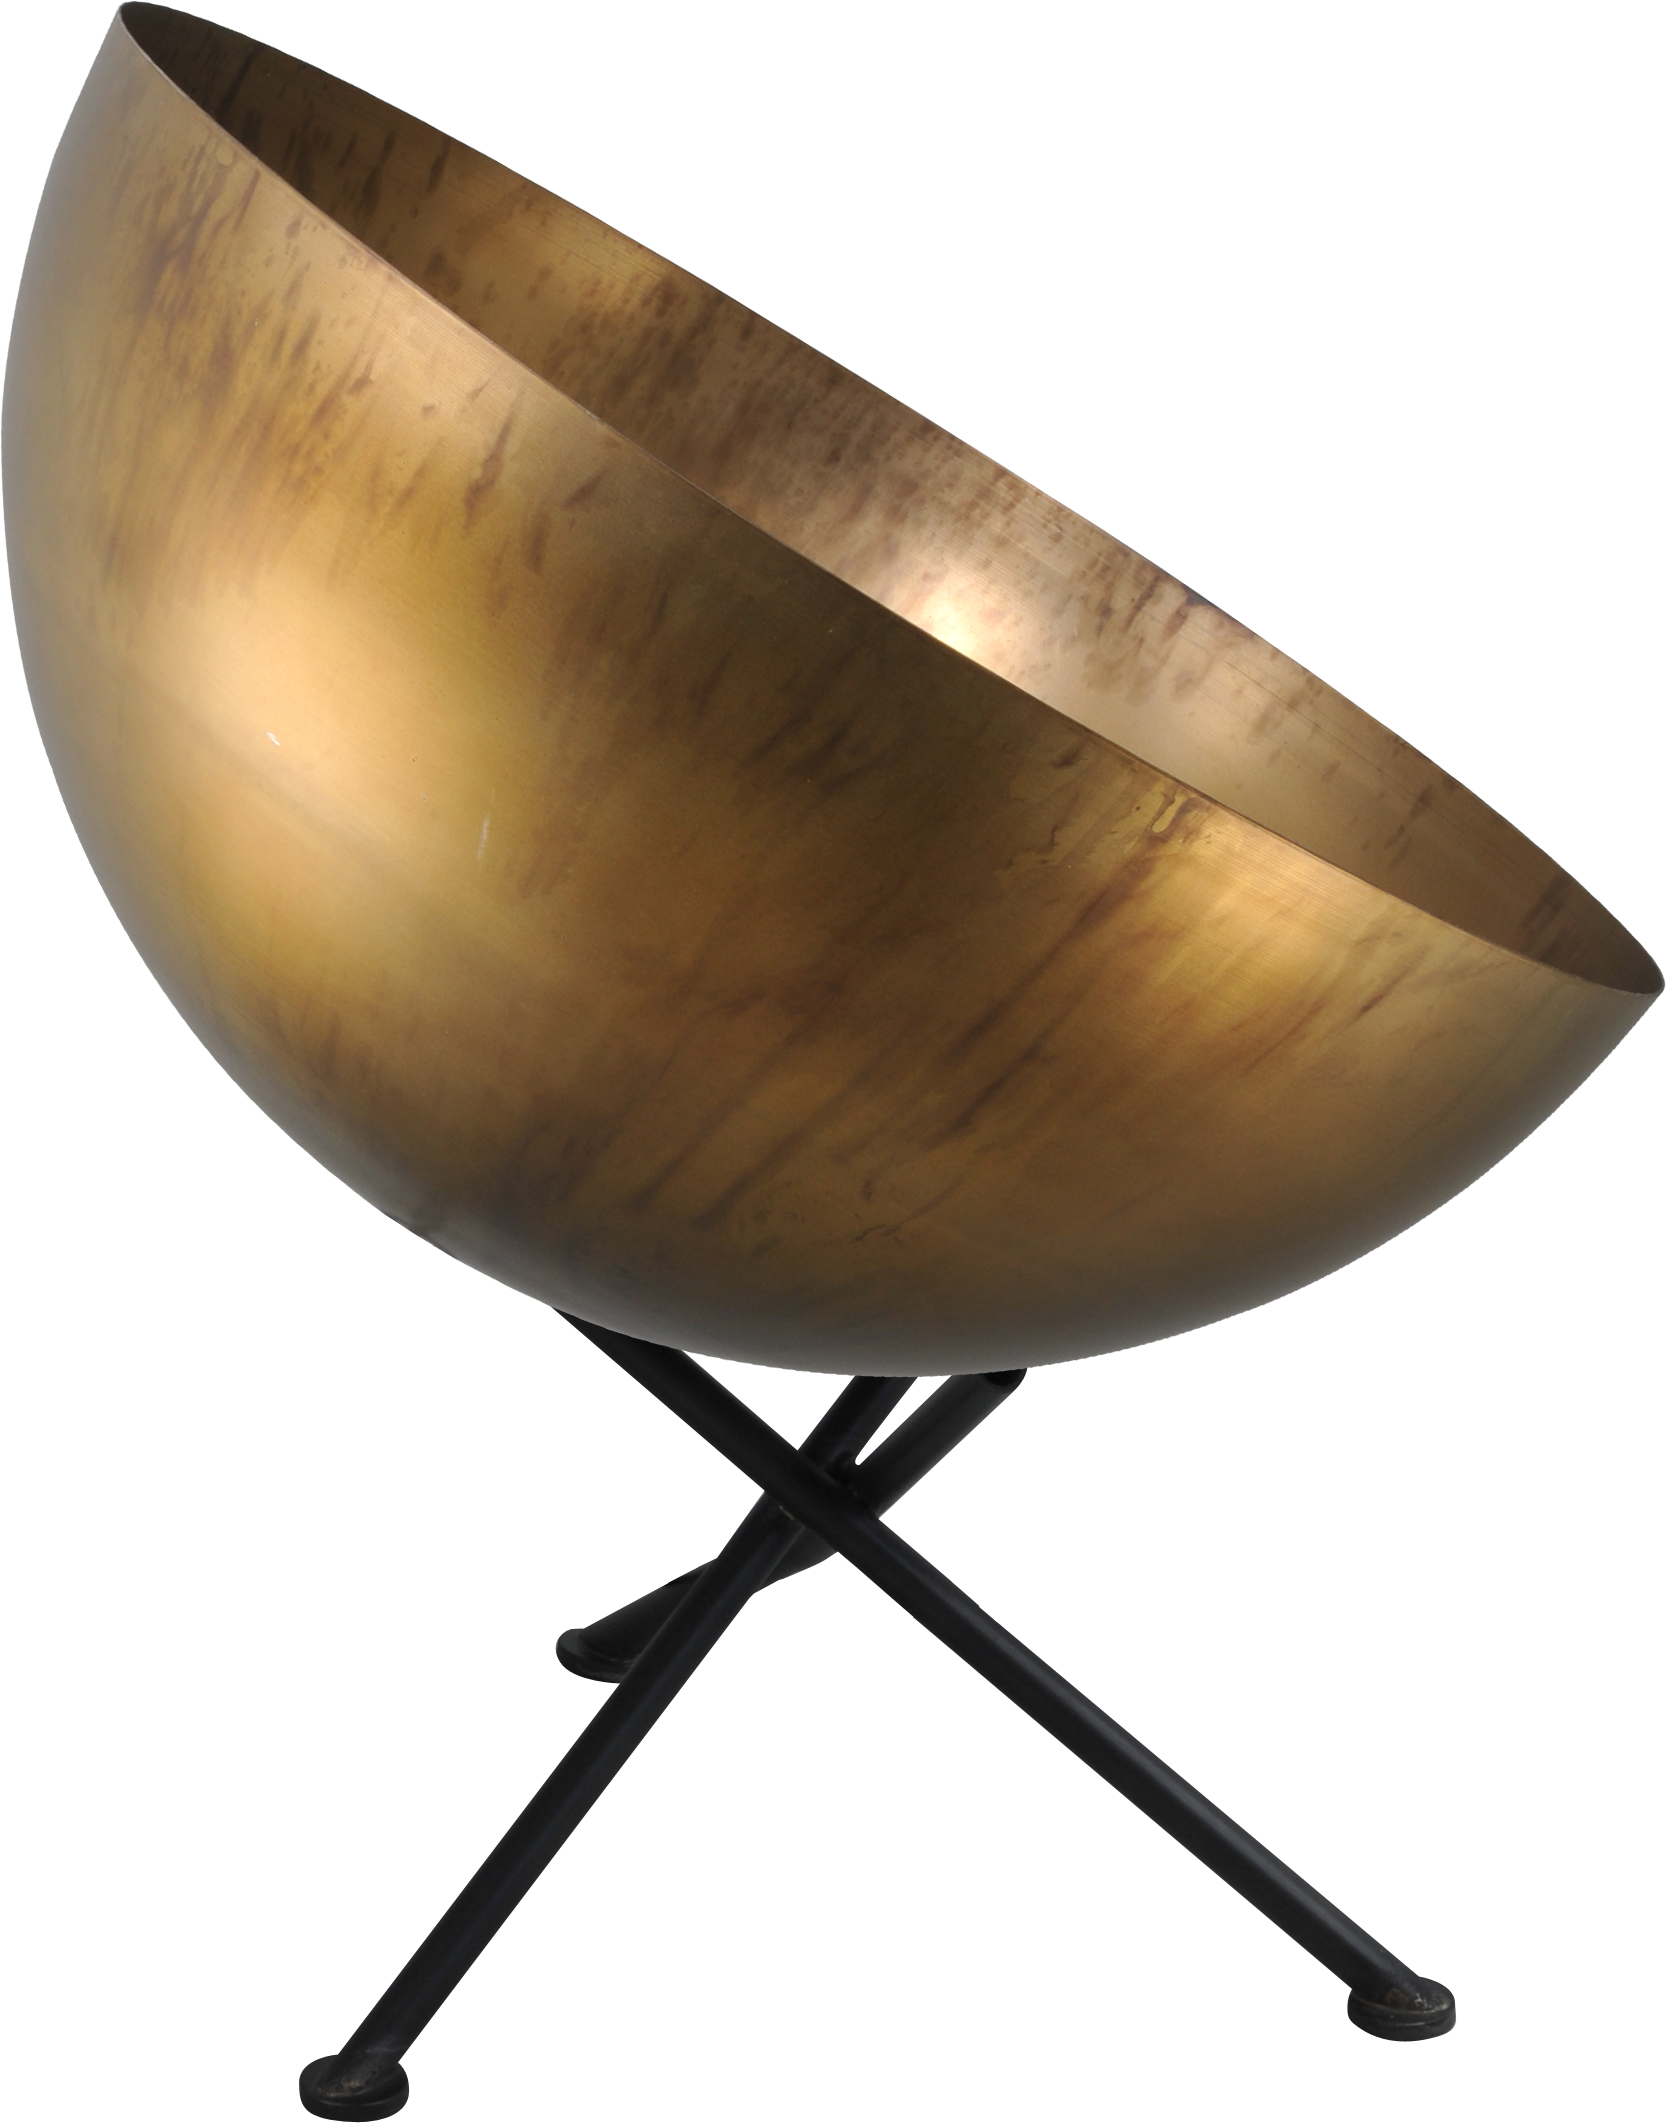 Larino Antique Brass TL LARINO D.40CM AGED BRASS EXTERIOR E27